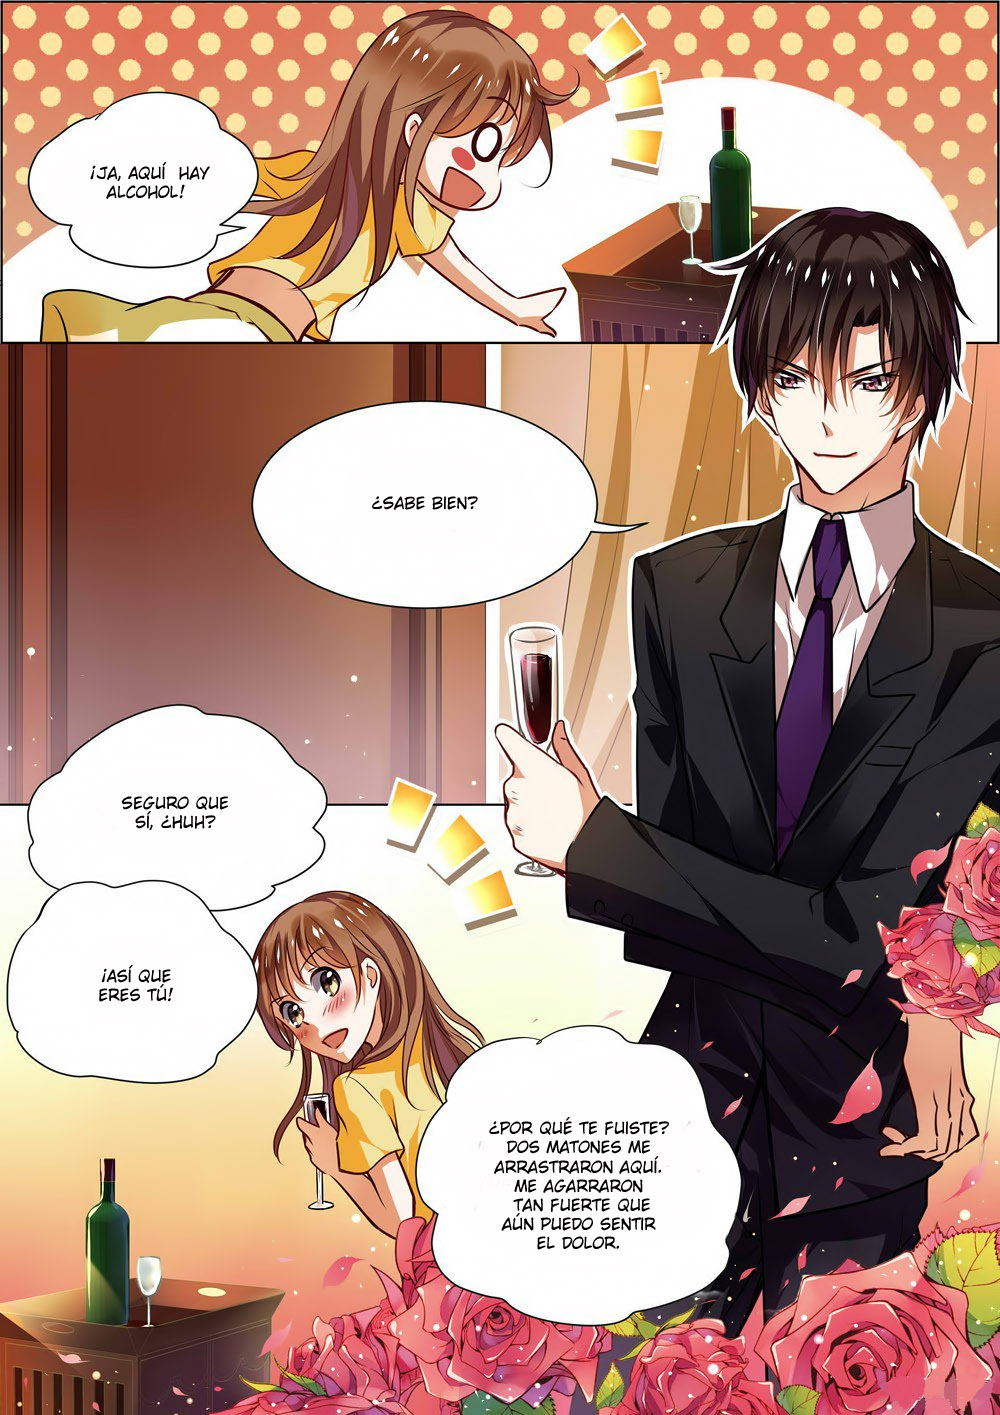 http://c5.ninemanga.com/es_manga/5/16069/385054/0a2fbc3a7639168c9e918f557d1802ac.jpg Page 6